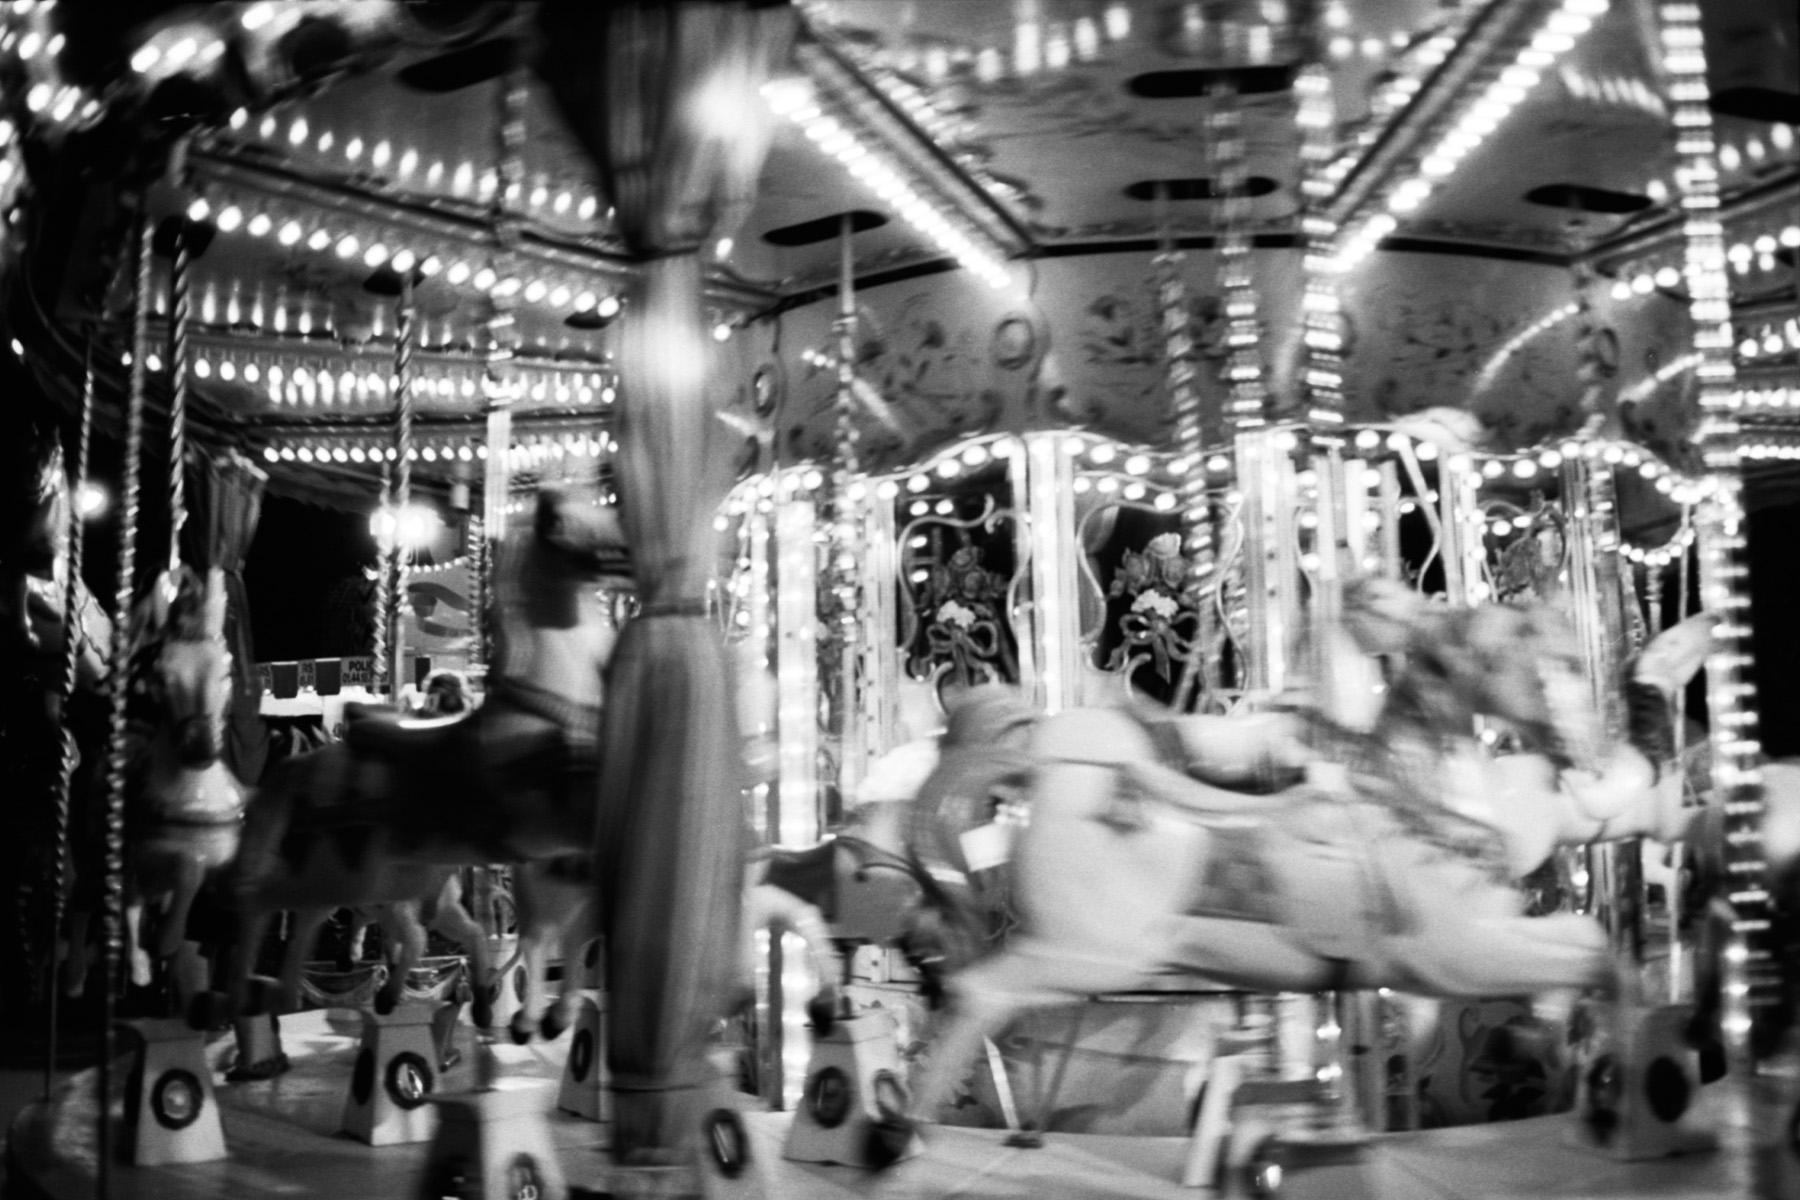 LiehSugai_Travel_Paris.Rome_07.jpg